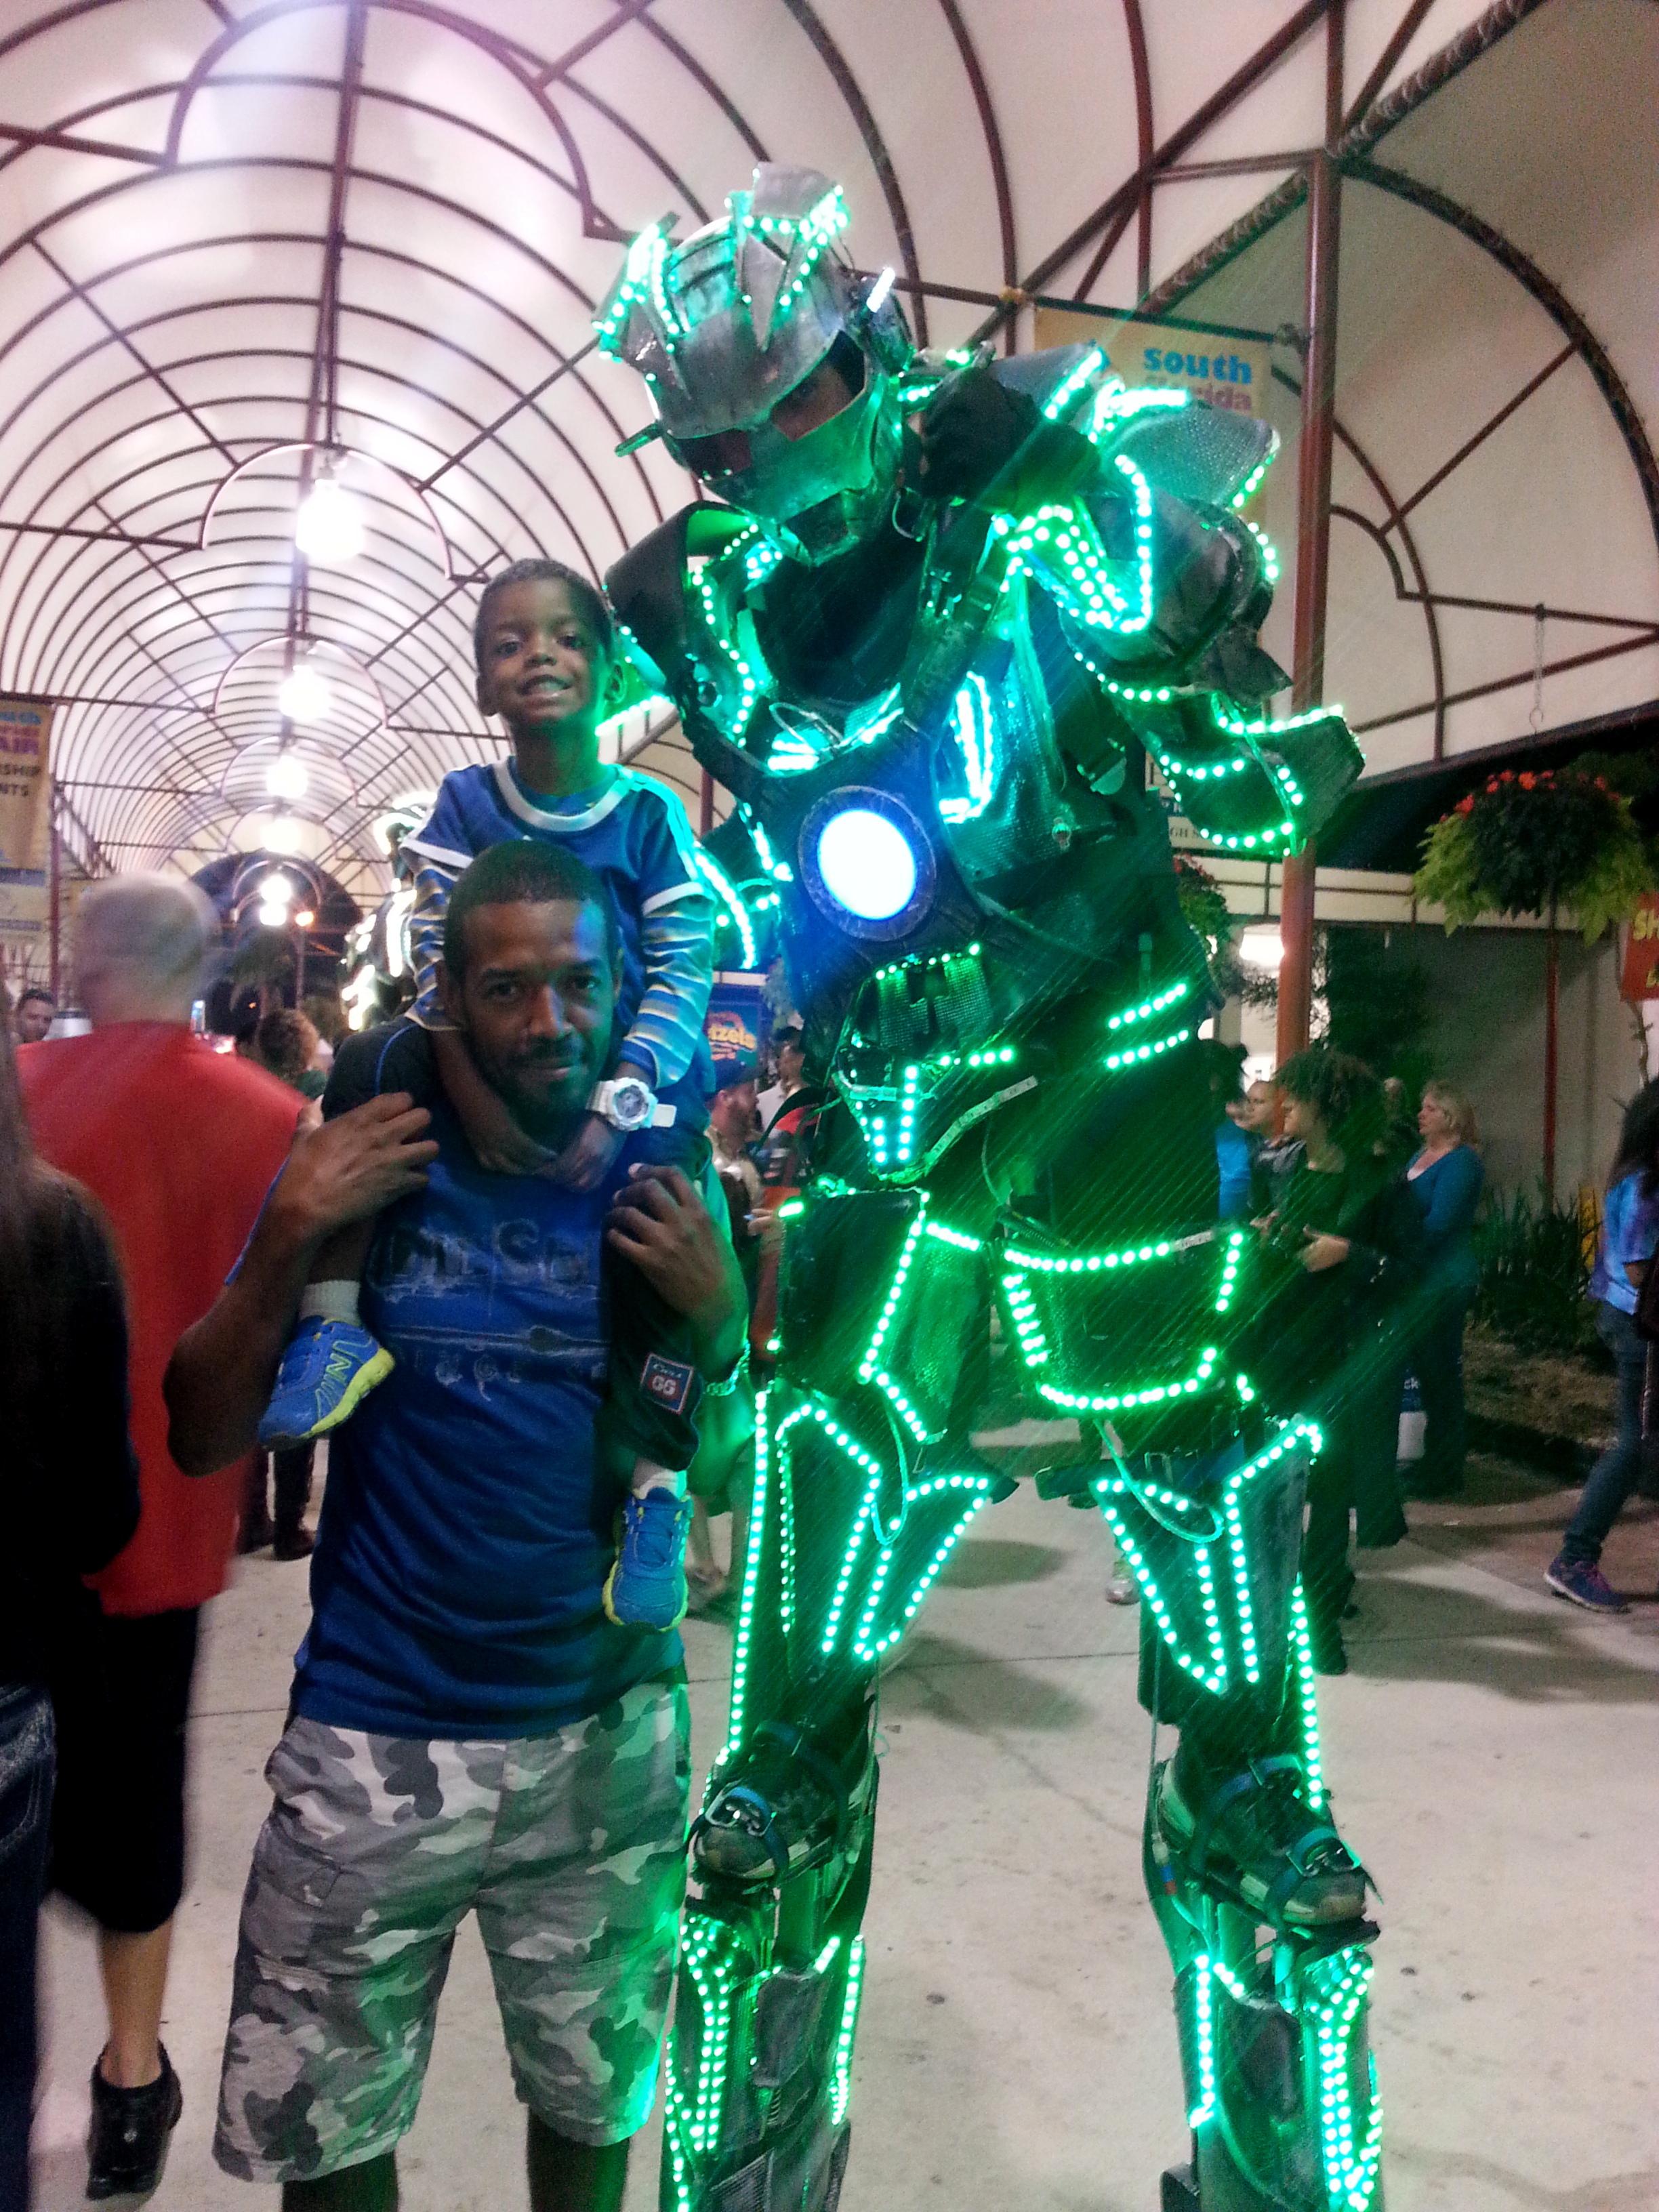 south florida fair LED robots daddy and gabe